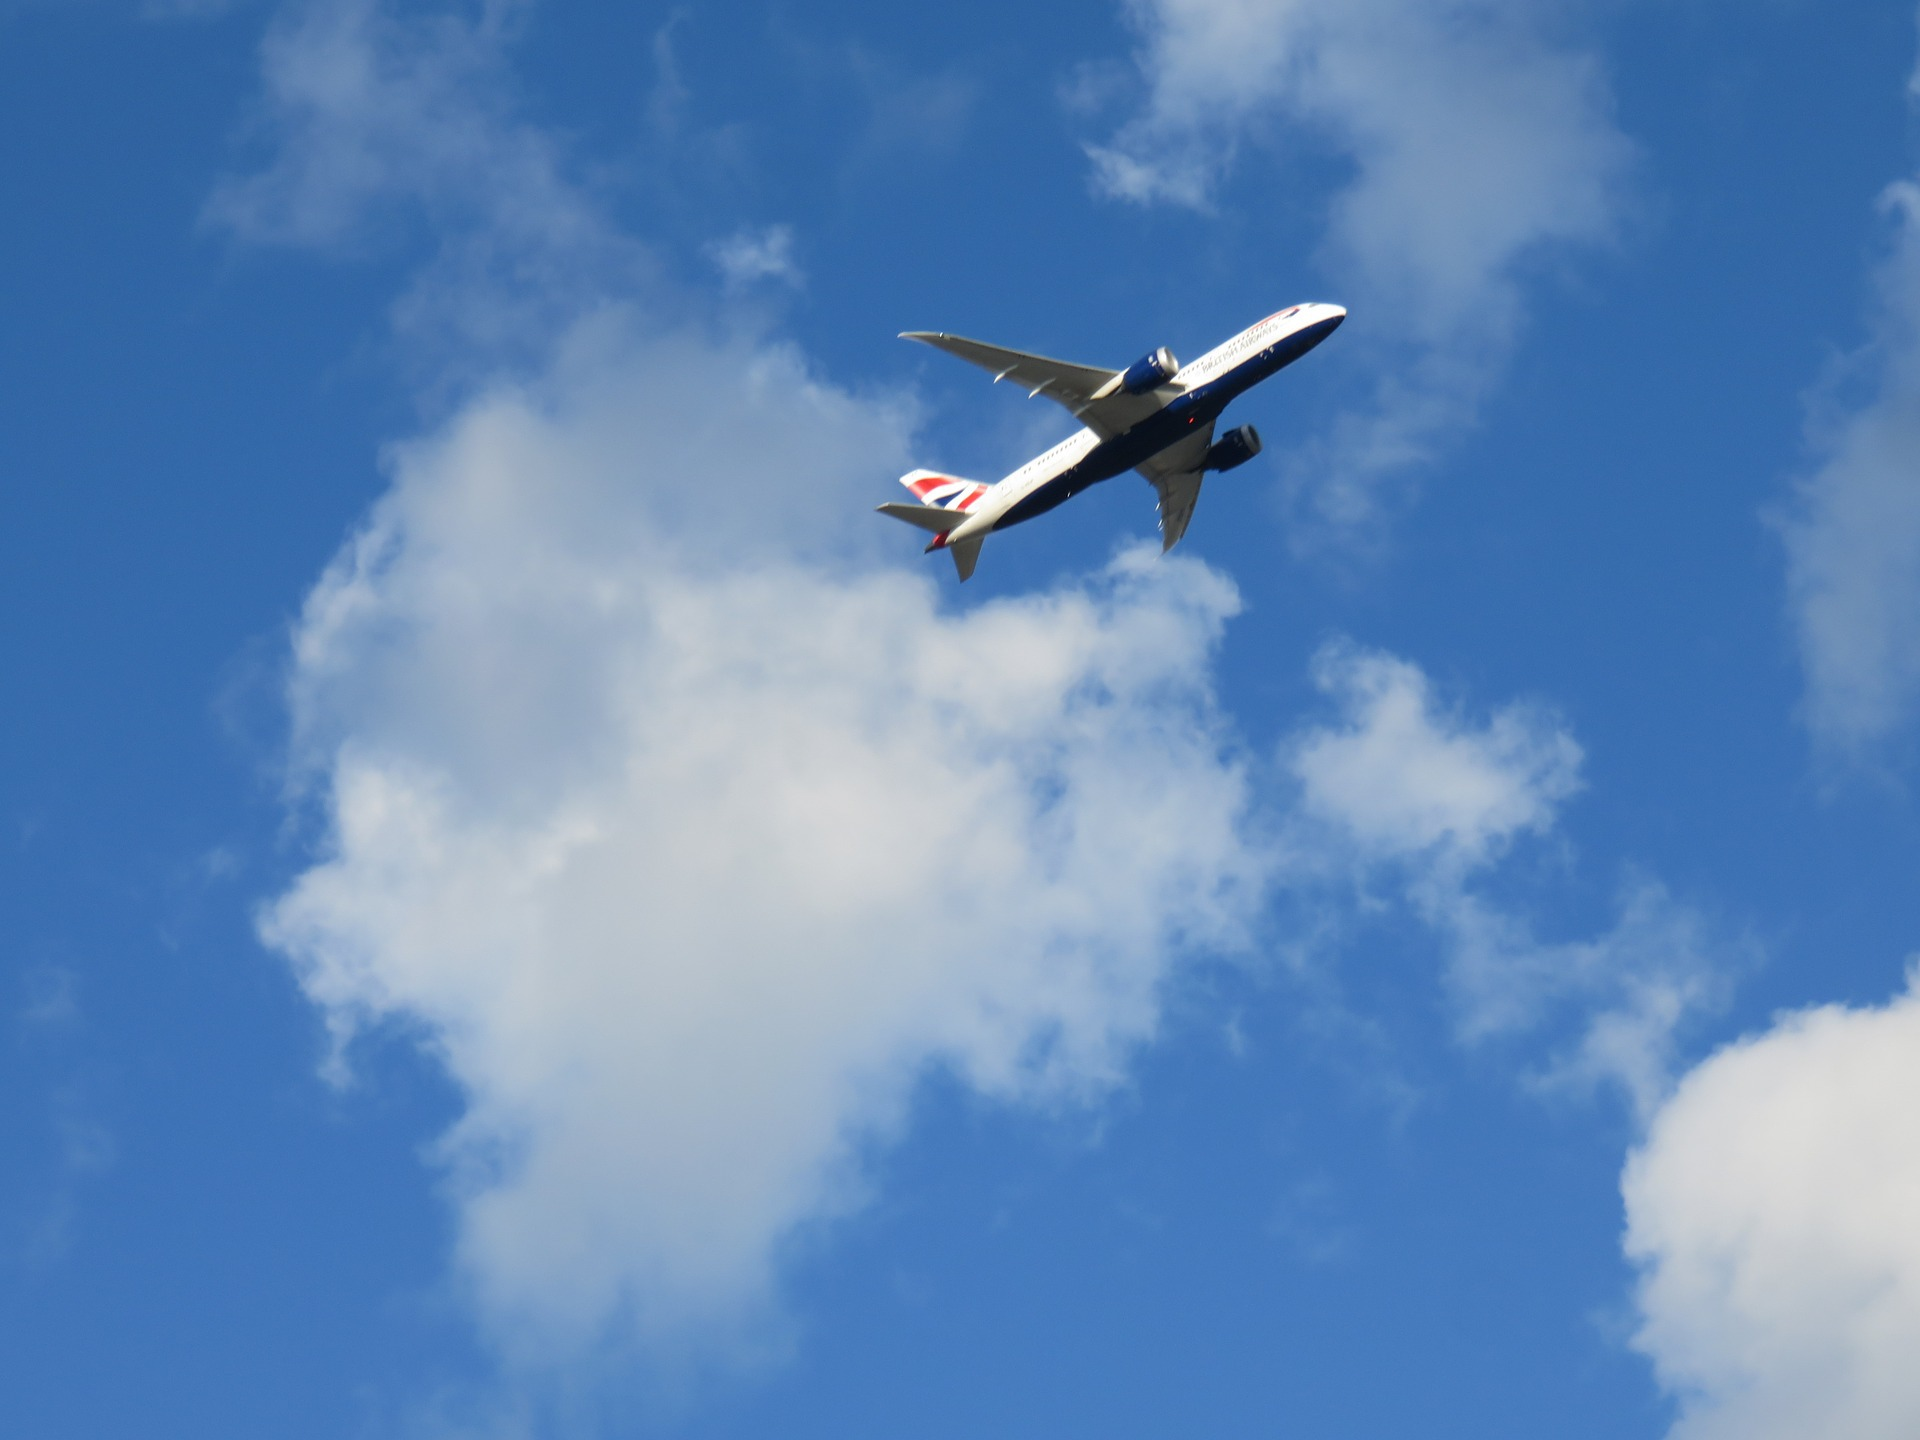 Plane High Definition